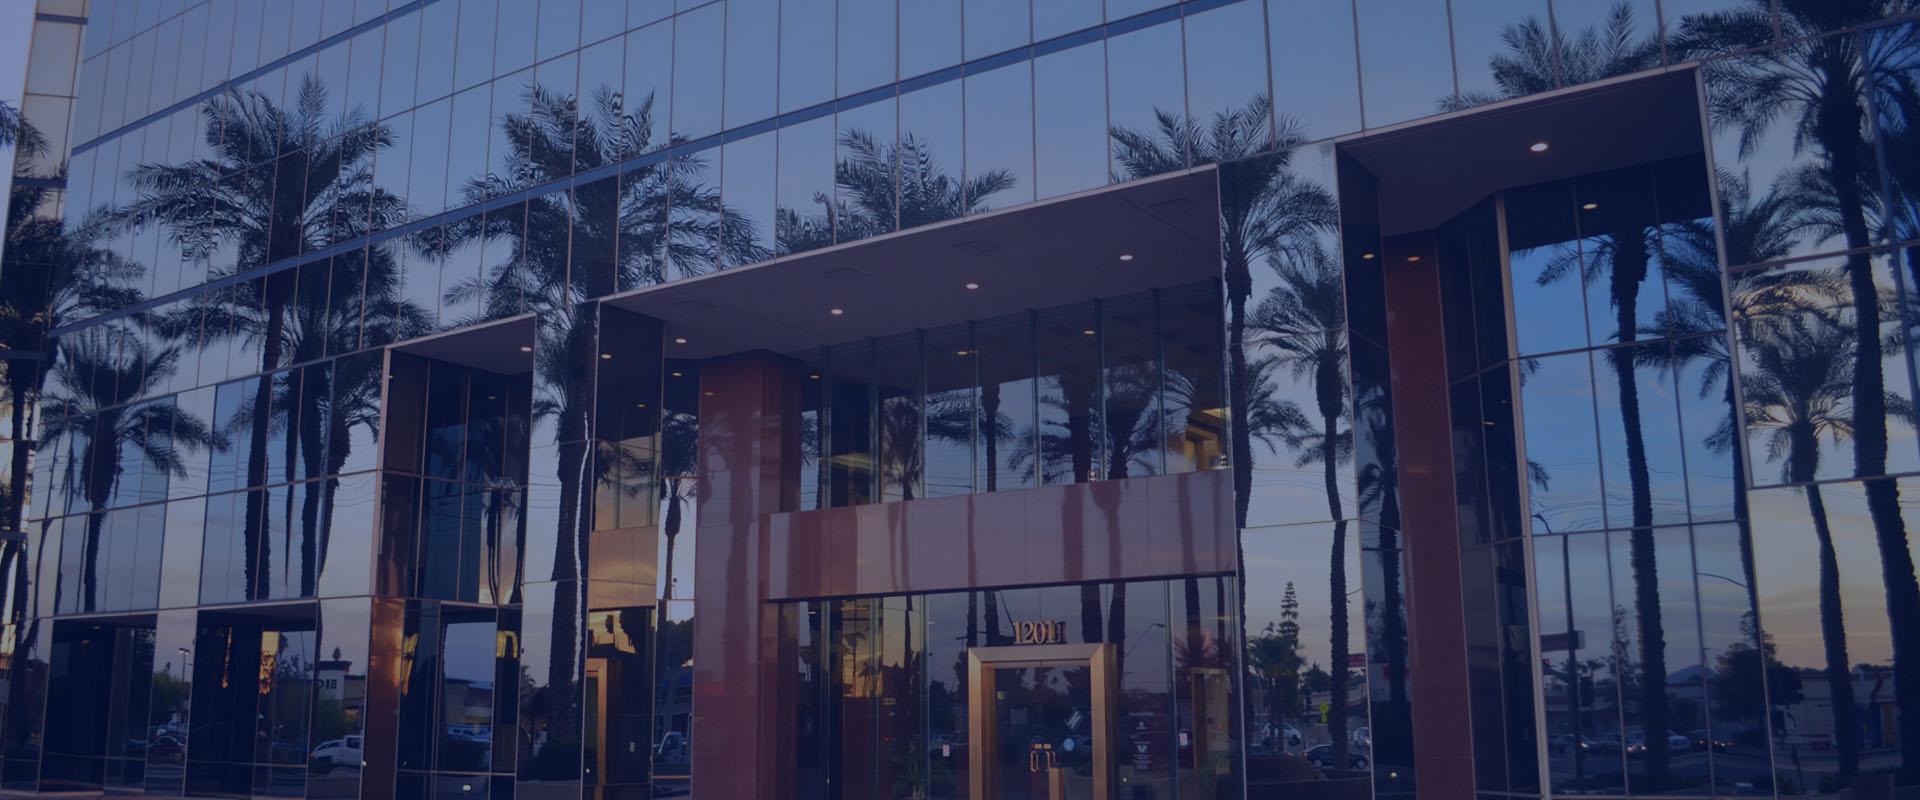 Arizona State Tax Law office Building